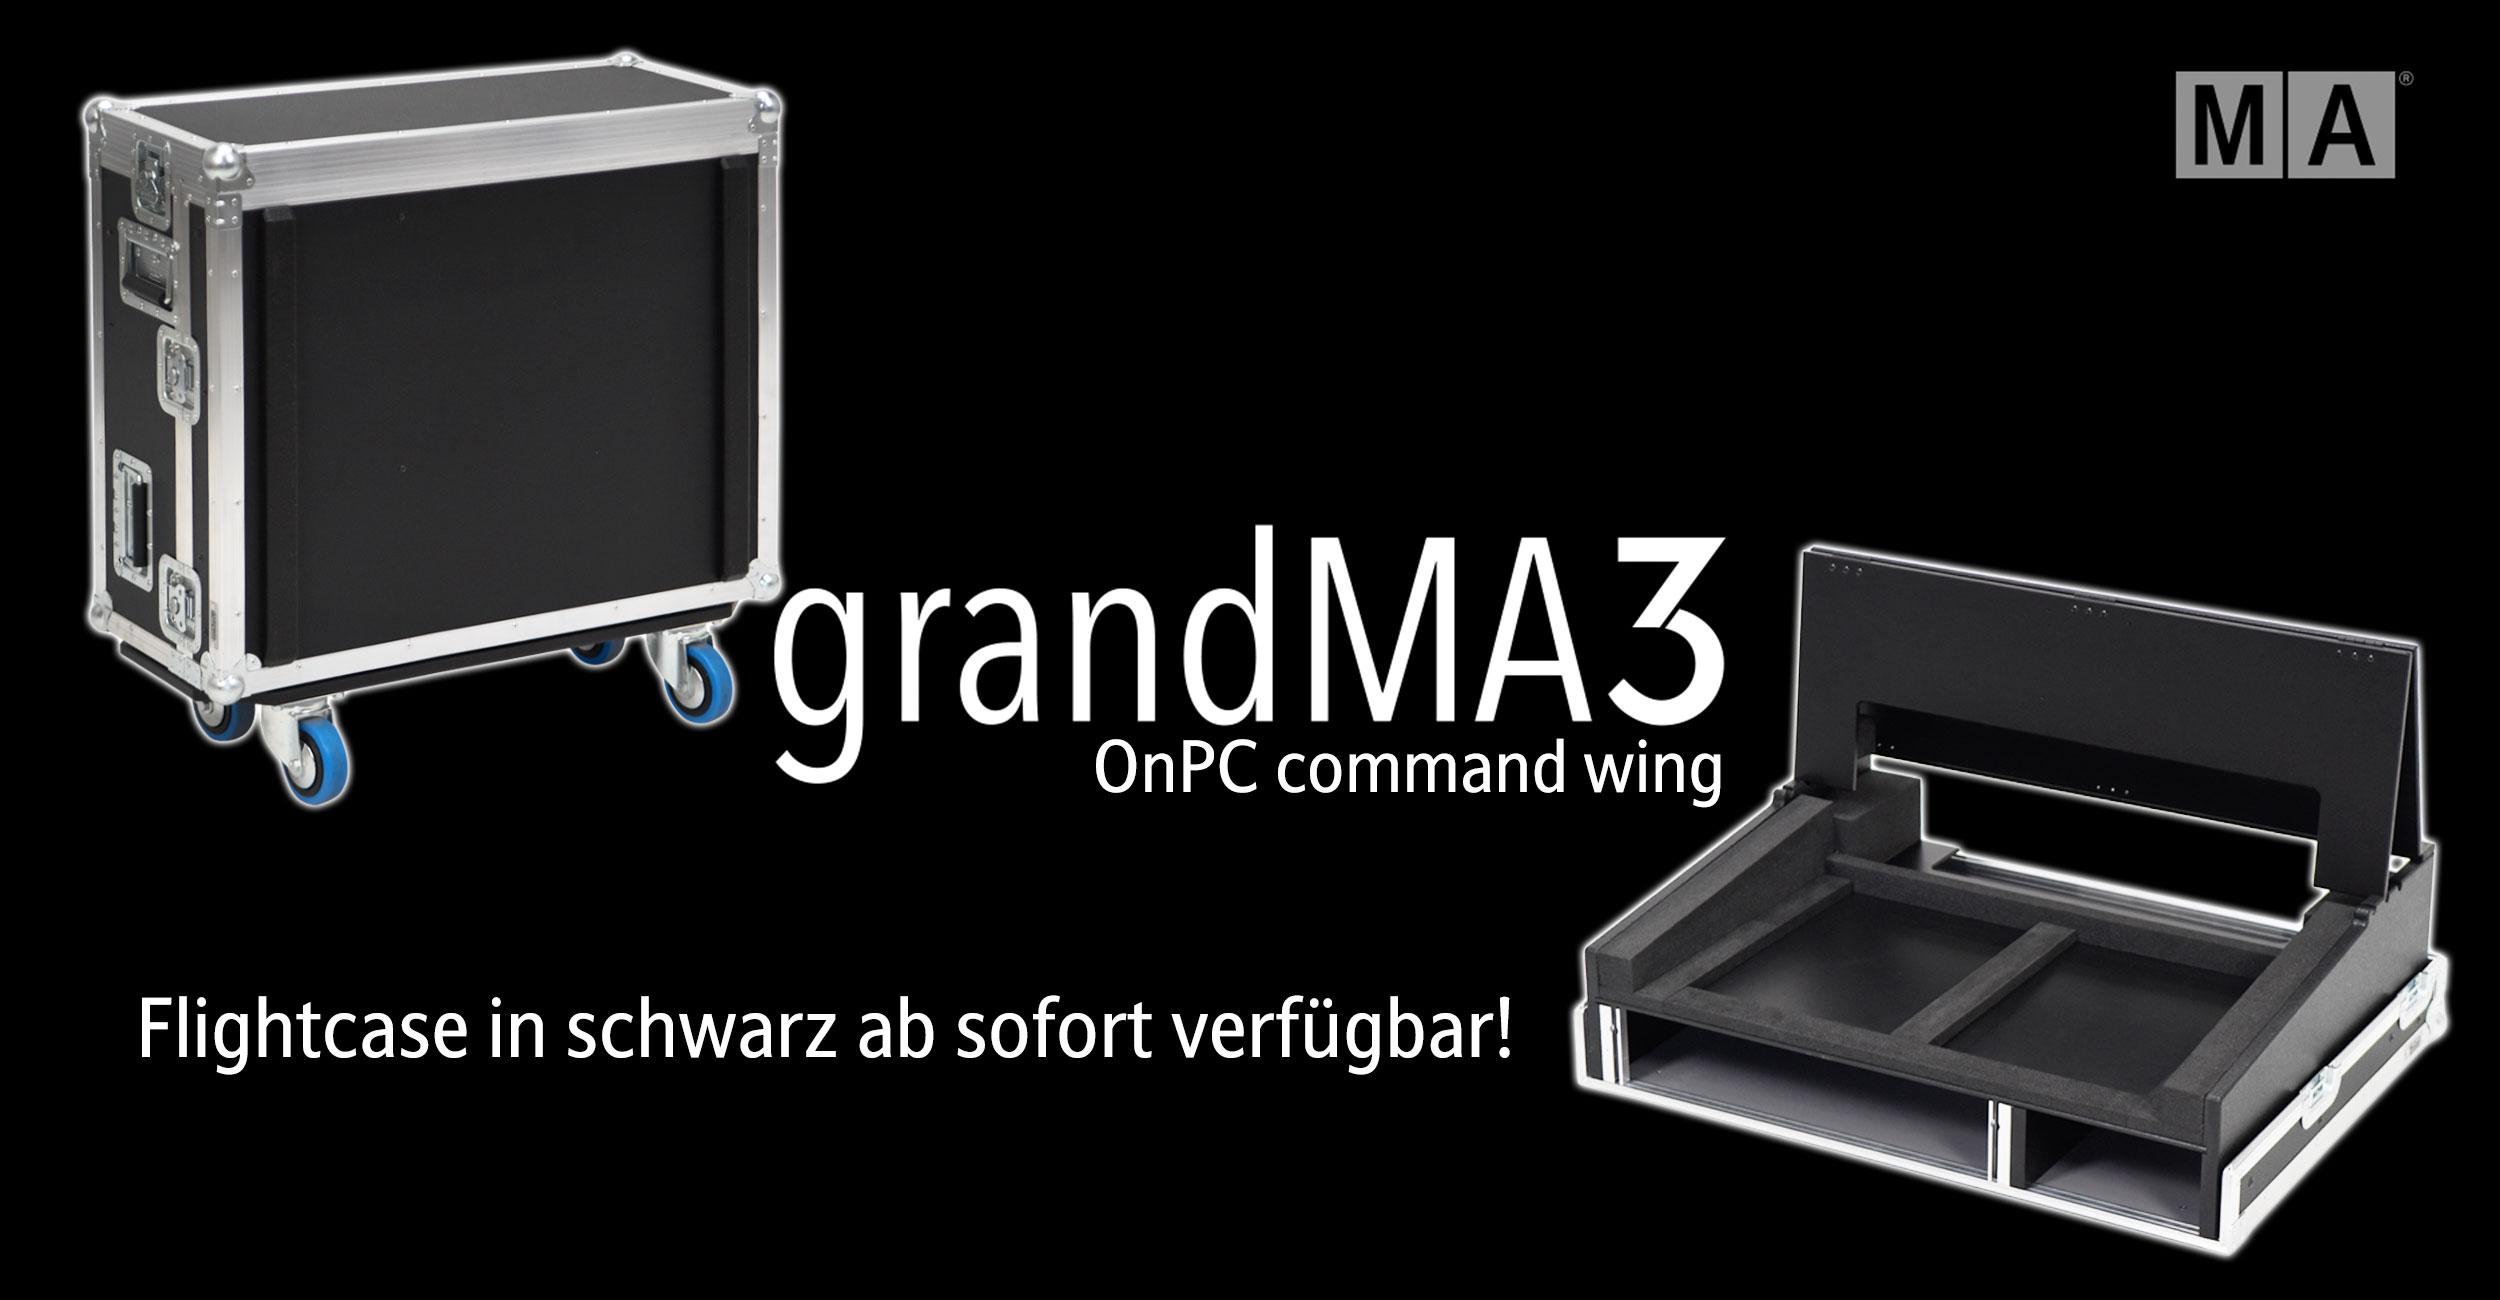 ProCase MA Lightning grandMa3 Command Wing onPC